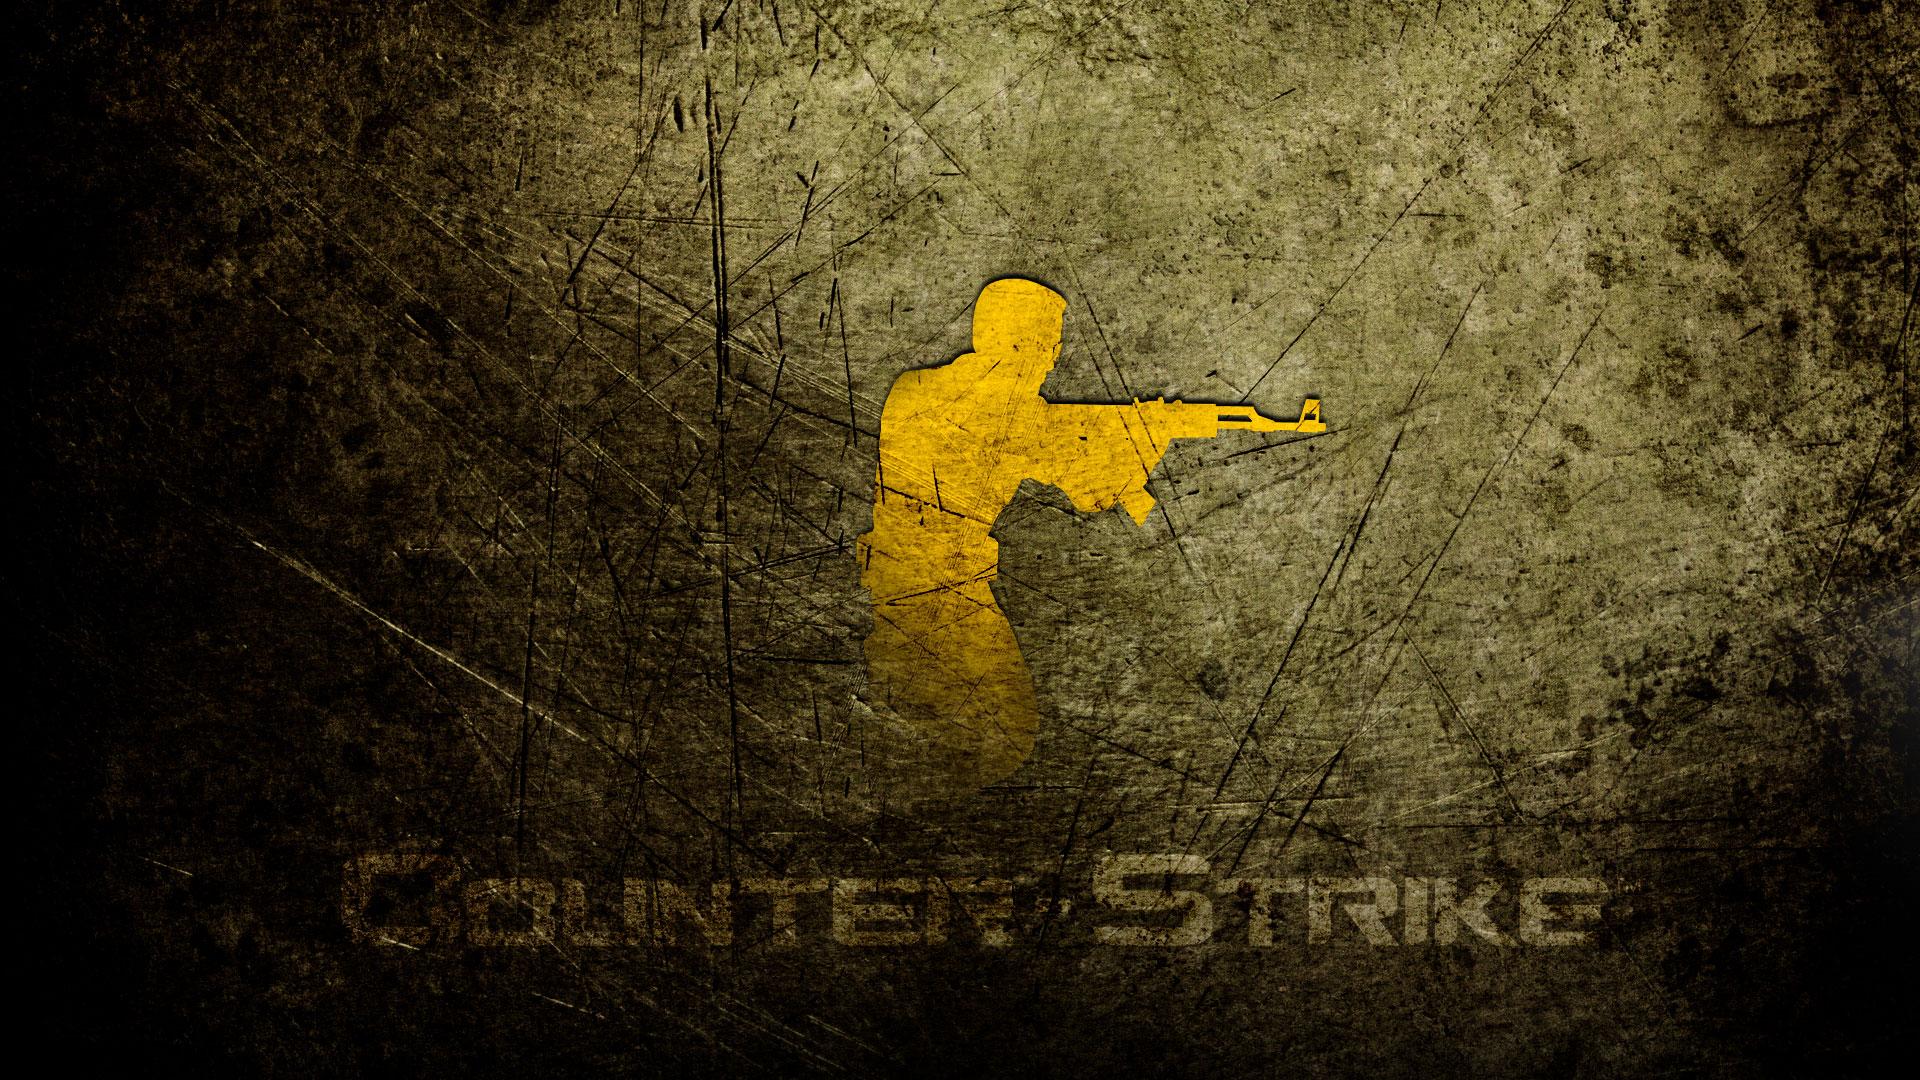 counter strike wallpaper hd